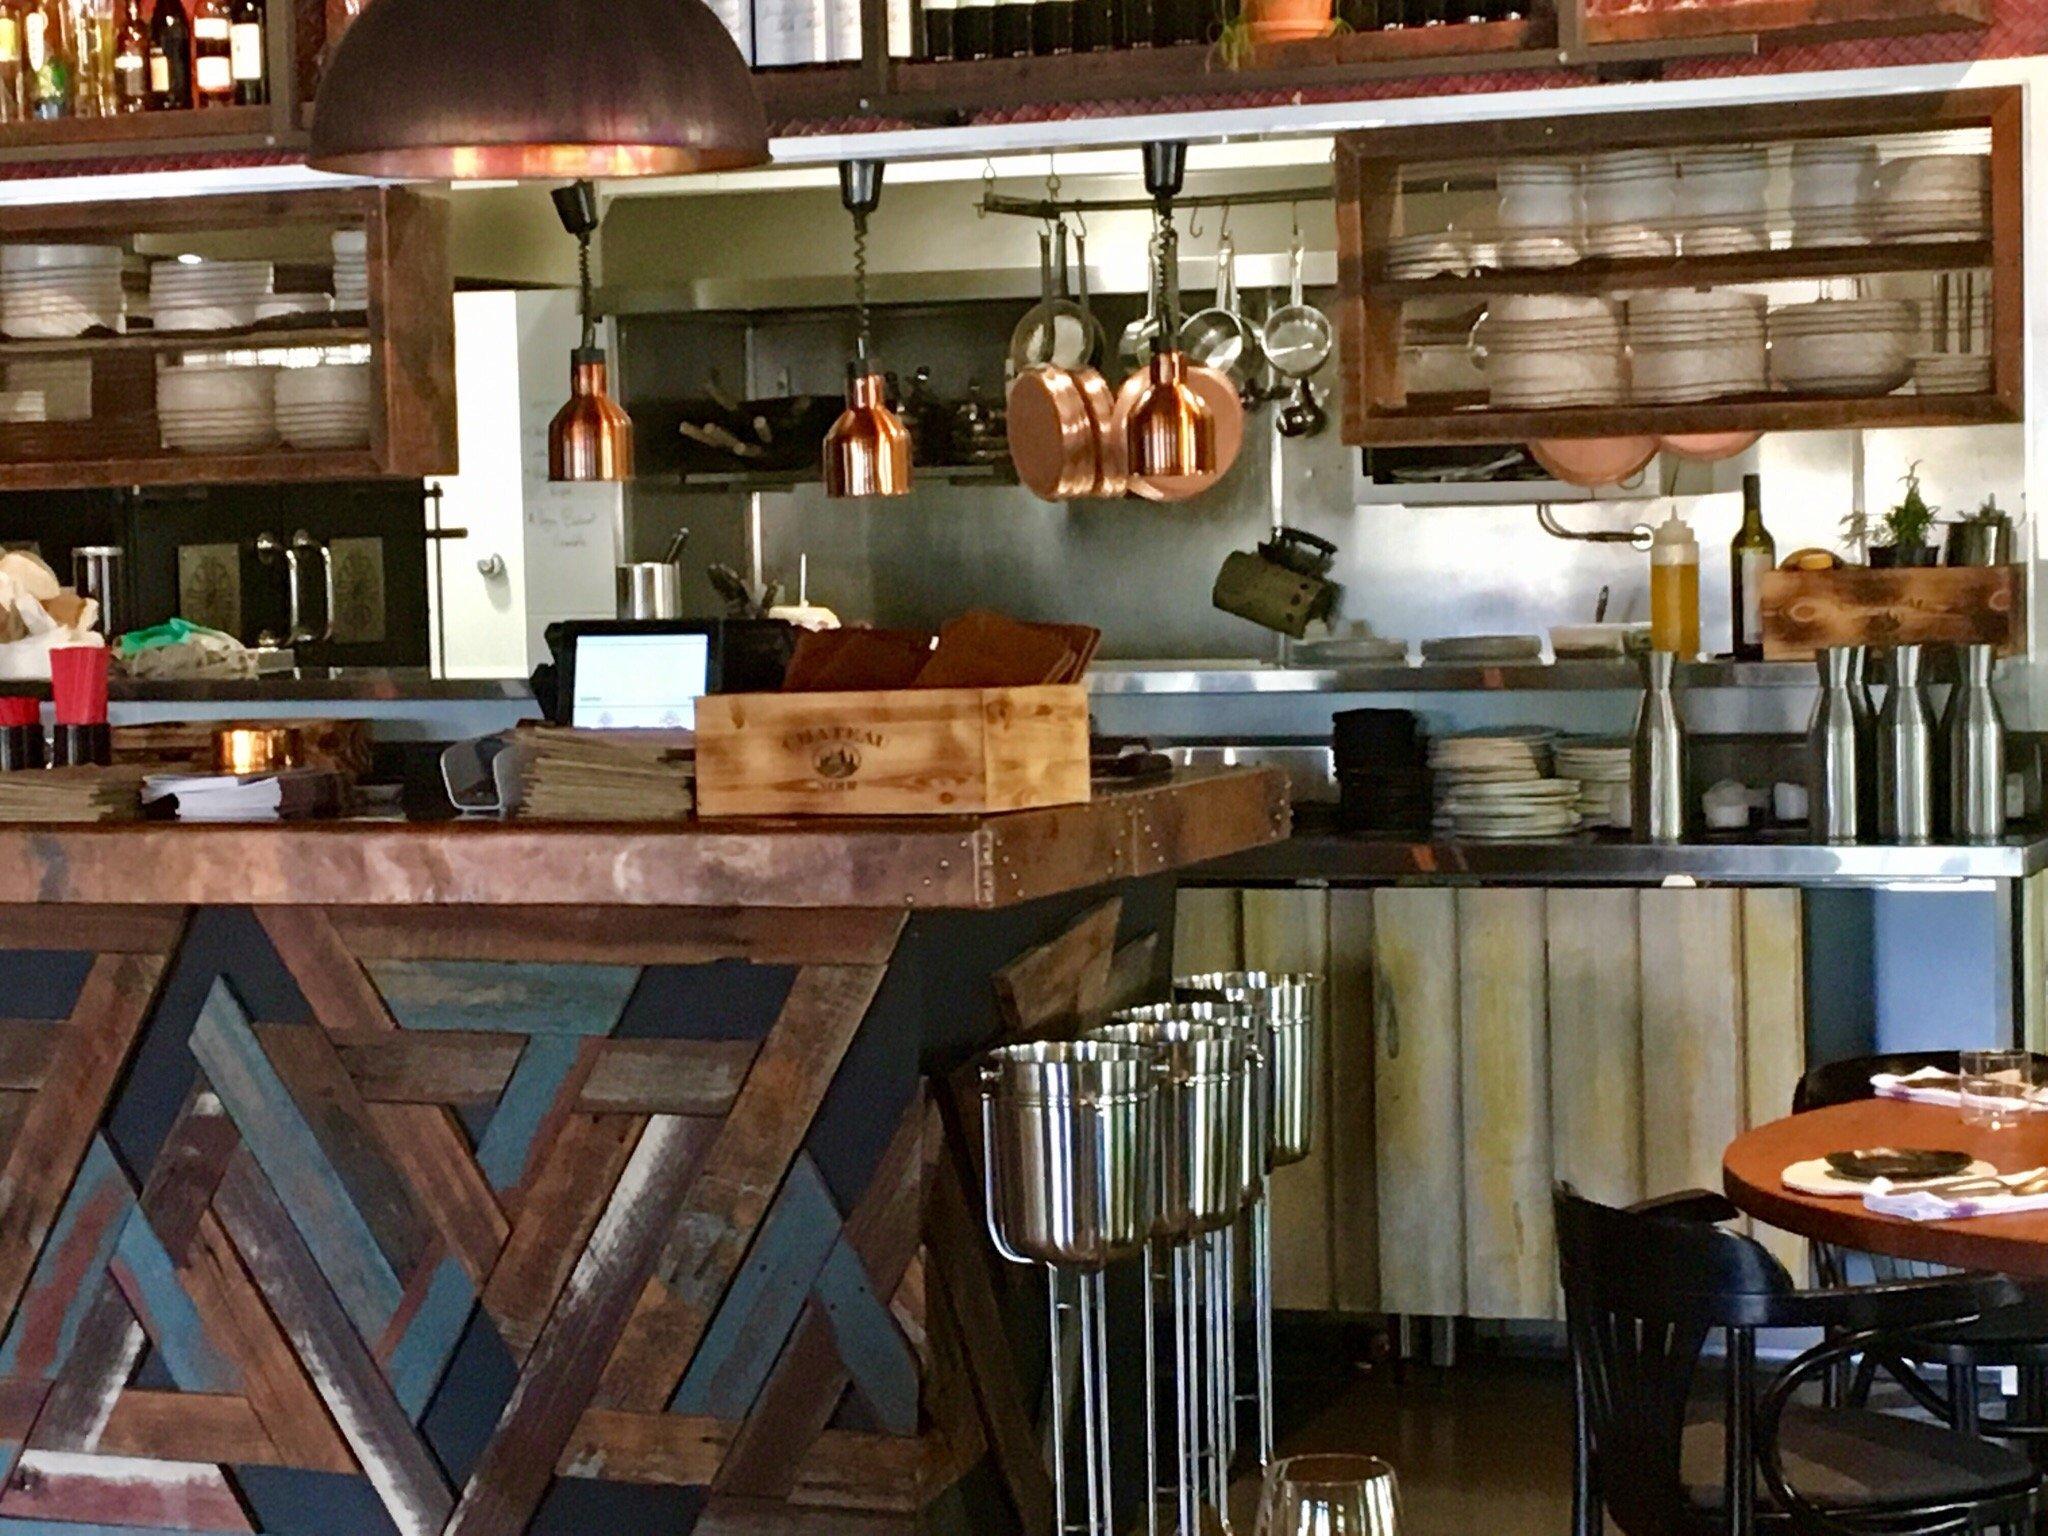 Charred Kitchen & Bar   1-5 New Street, Orange, New South Wales 2800   +61 2 6363 1580